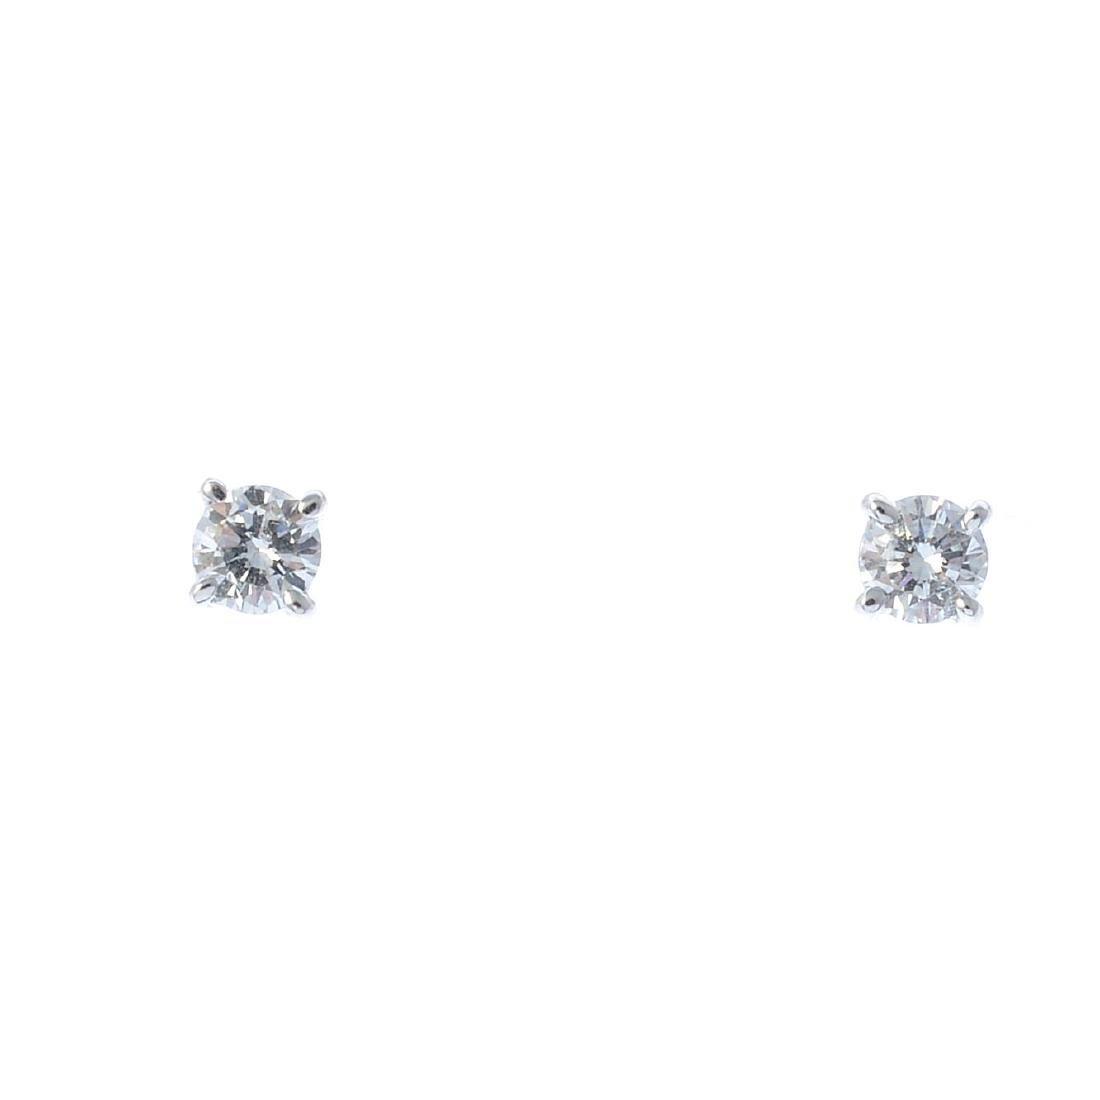 A pair of 9ct gold brilliant-cut diamond stud earrings.